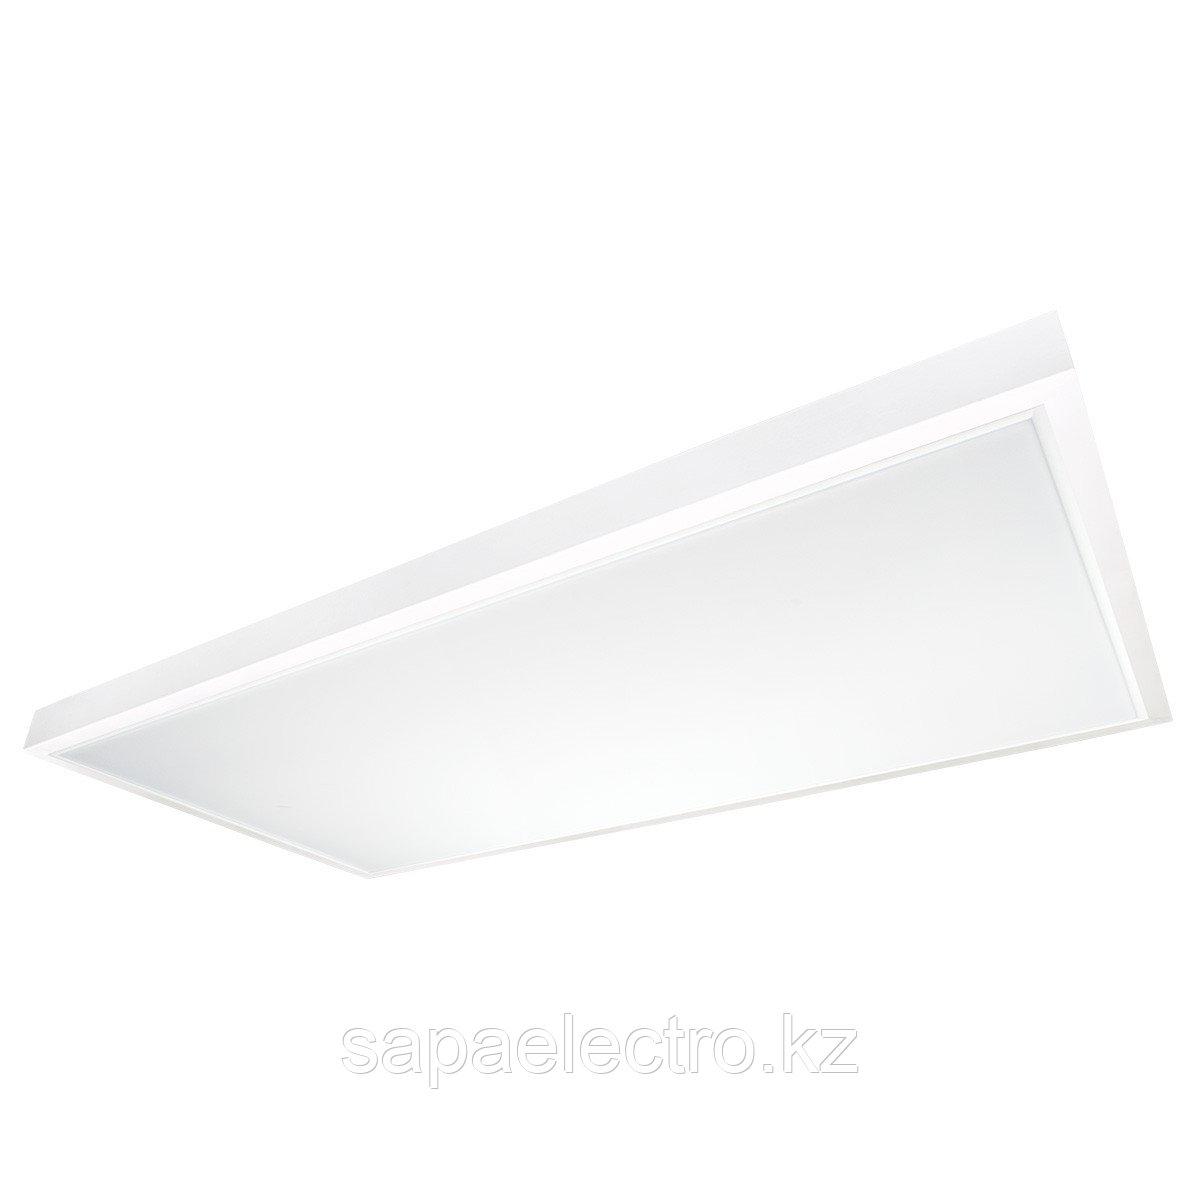 Св LEDTUBE  4x18W/ 120см OPAL MODERNAнакл(с лампой)